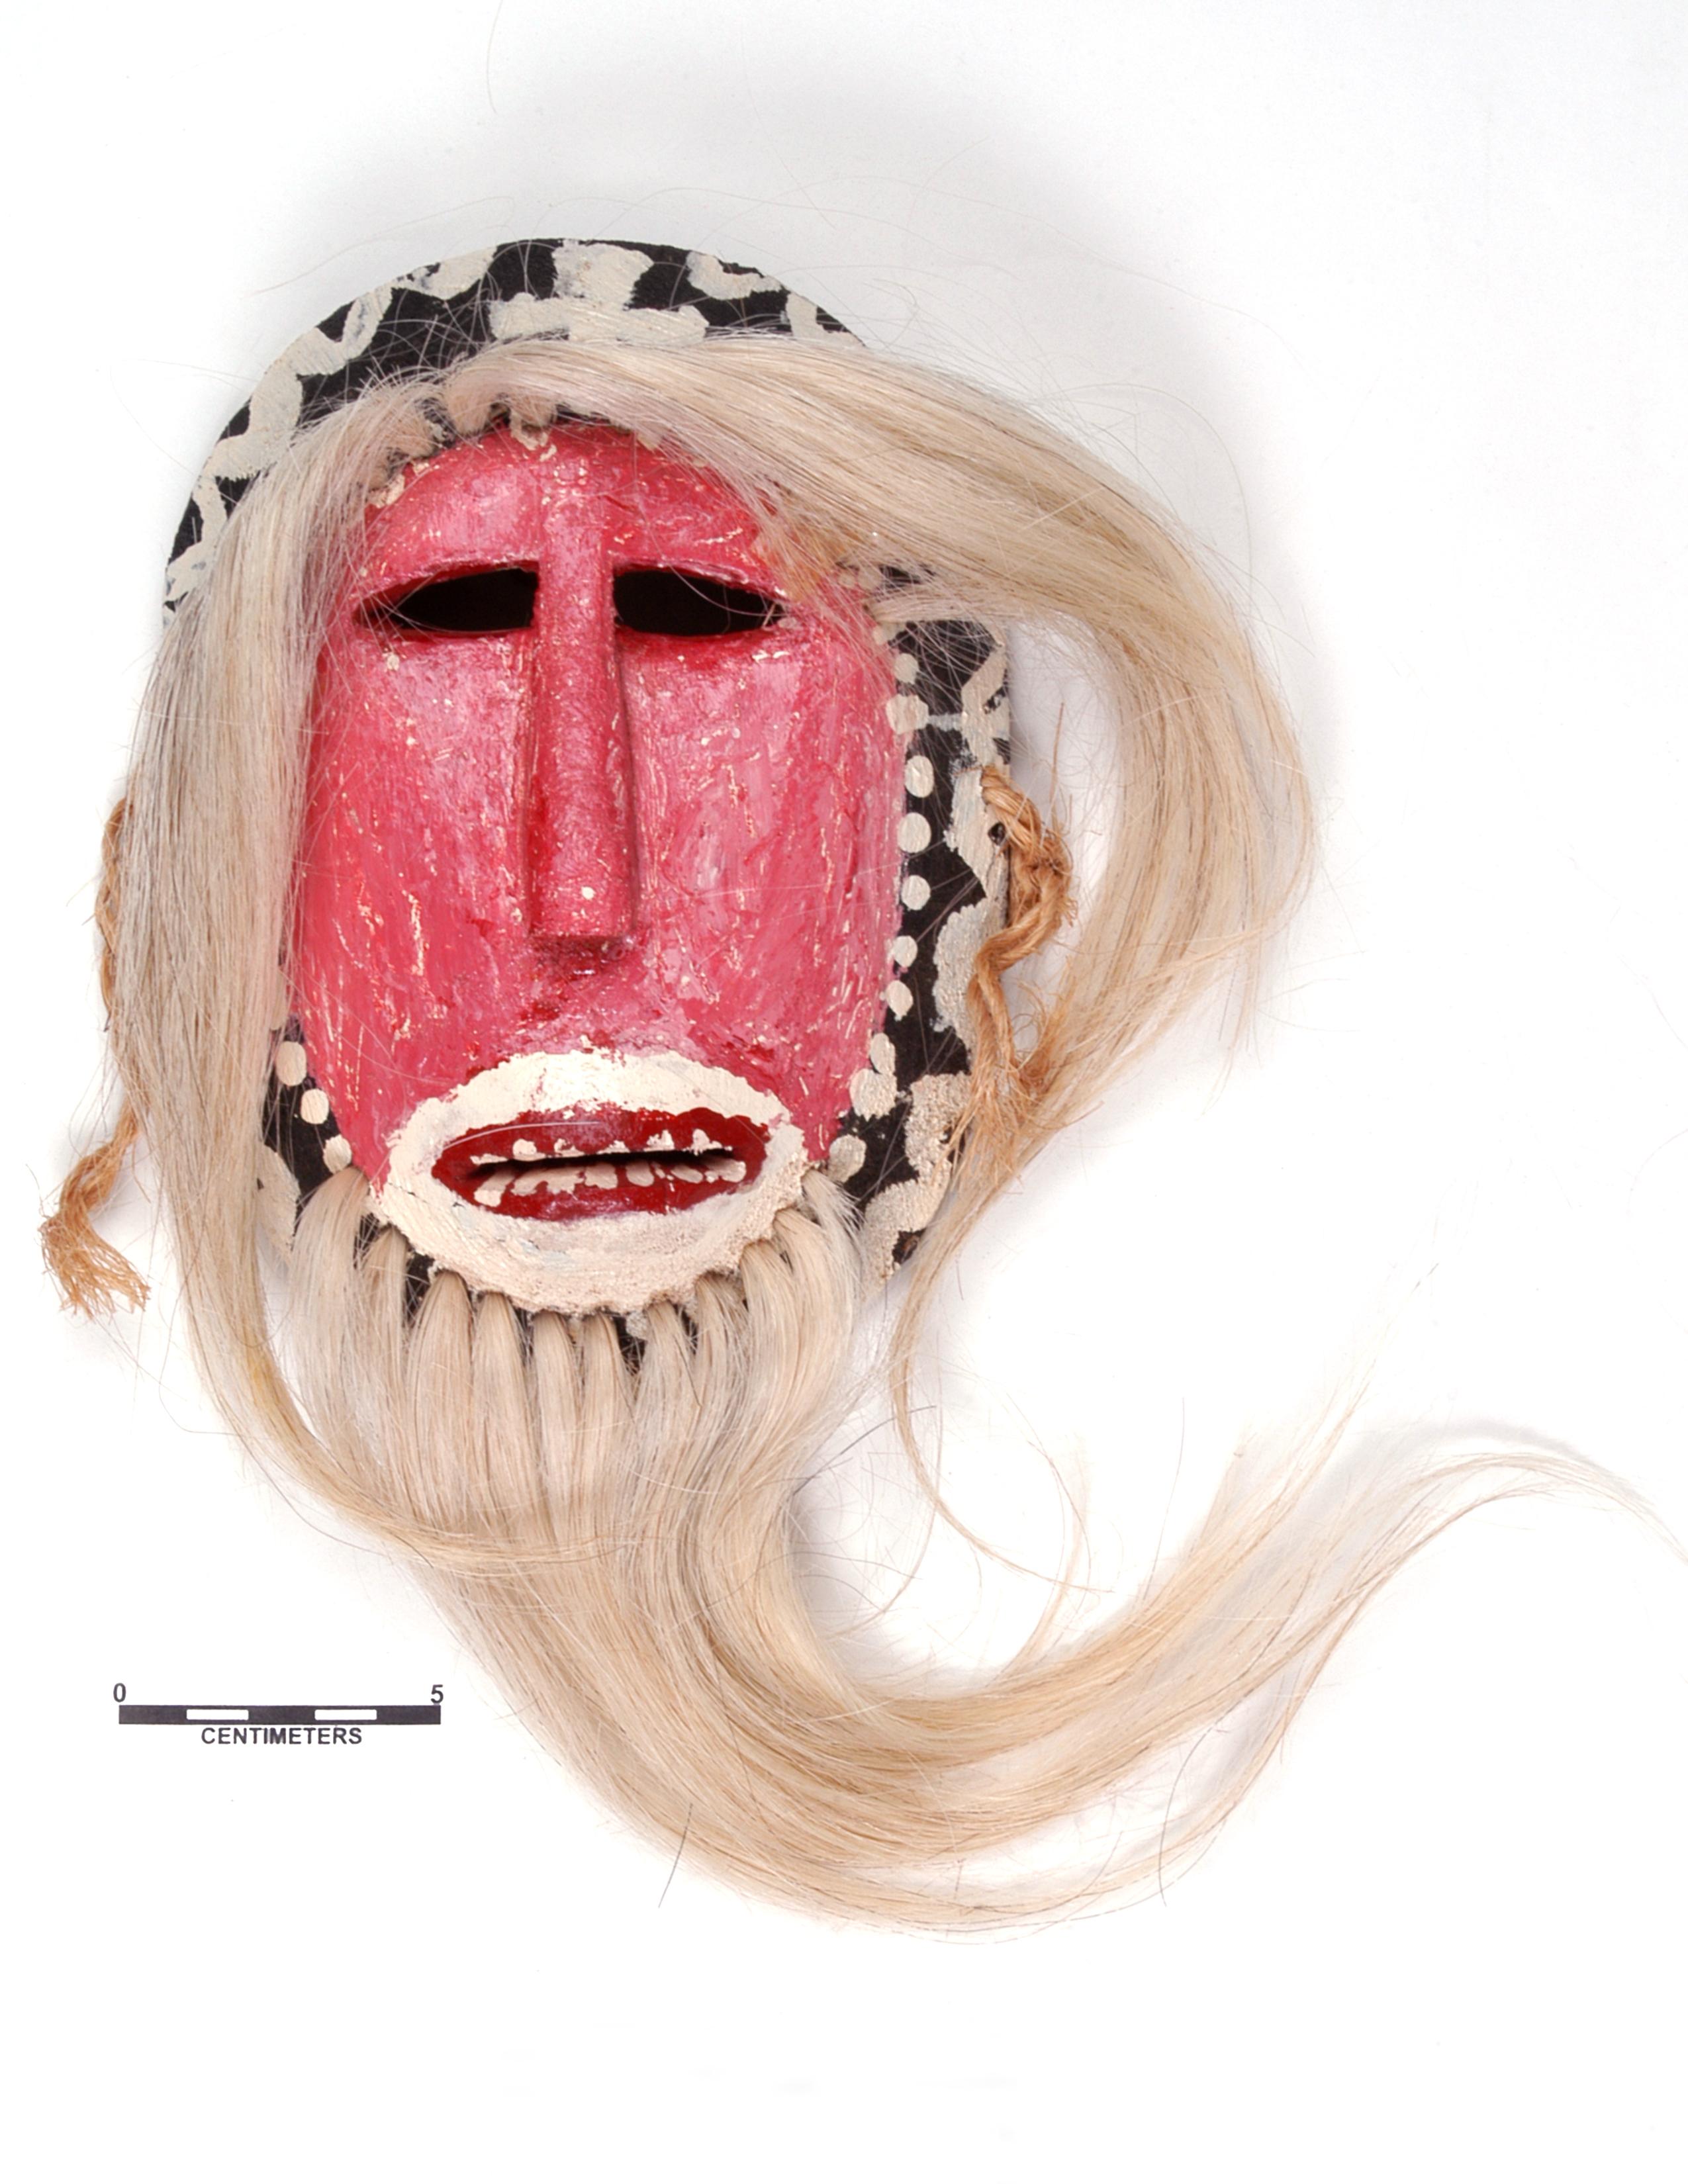 Maker: Prudencio Vásquez, San MIguel Zapotitlán; date made unknown, acquired 1965